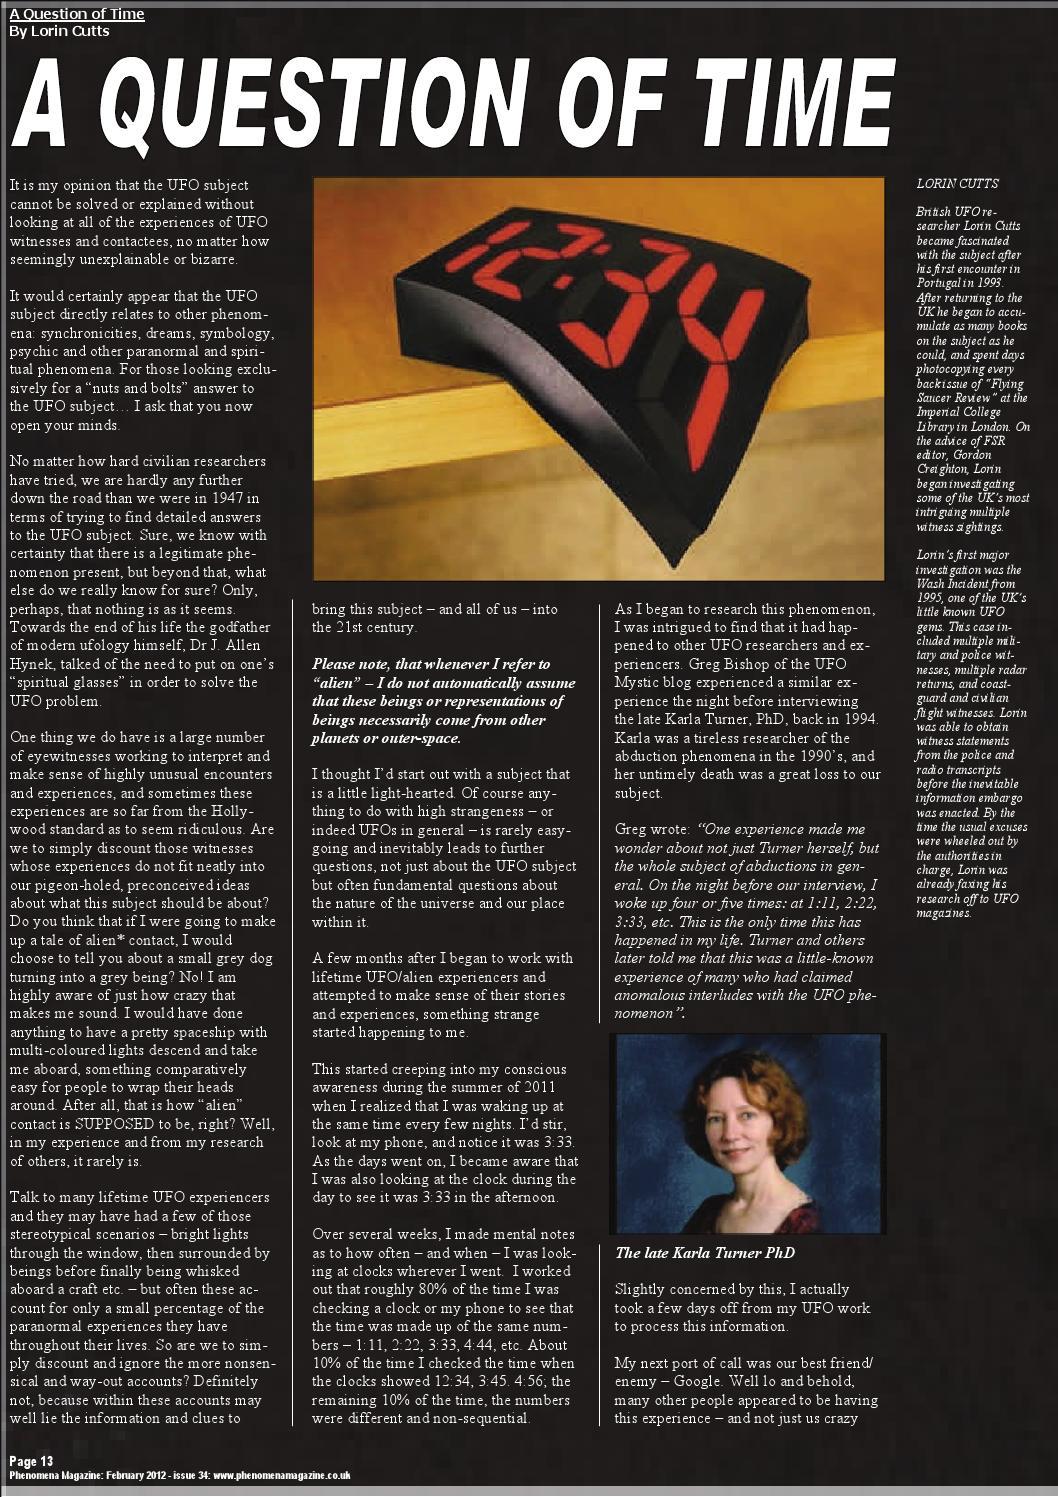 Phenomena Magazine - February 2012 - Issue 34 by Steve Mera - issuu